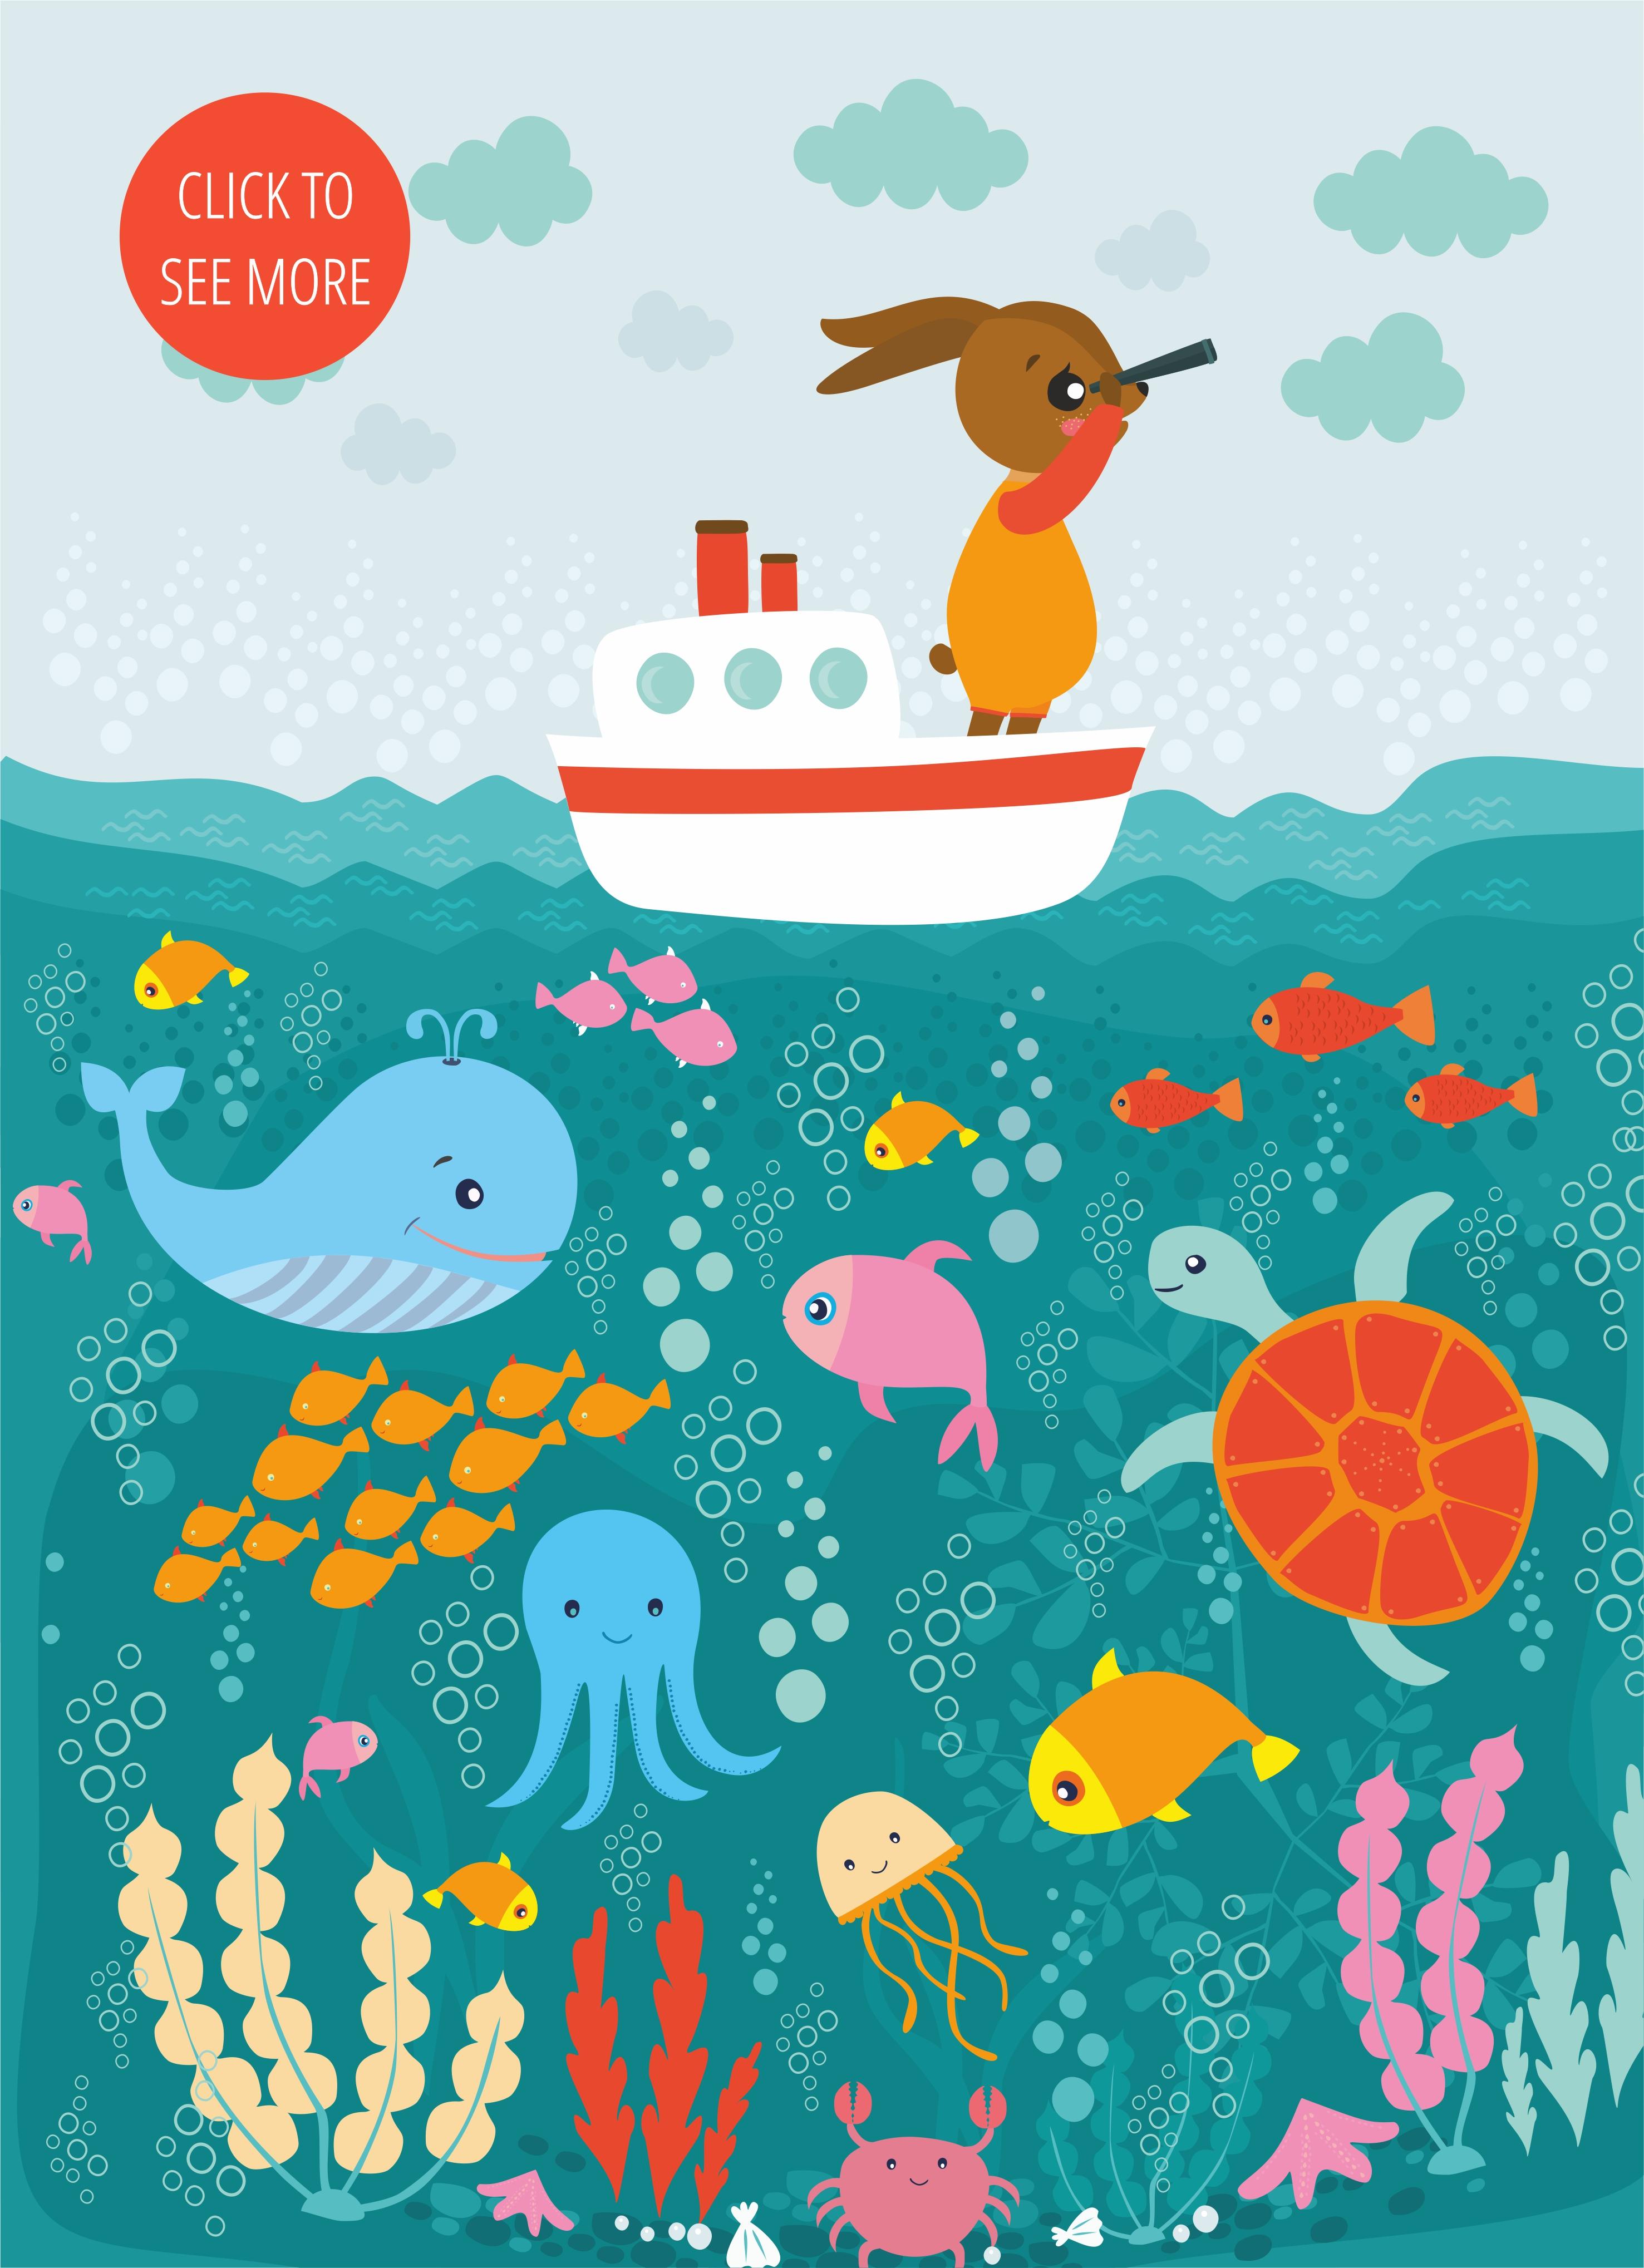 Sea Voyage with rabbit example image 2